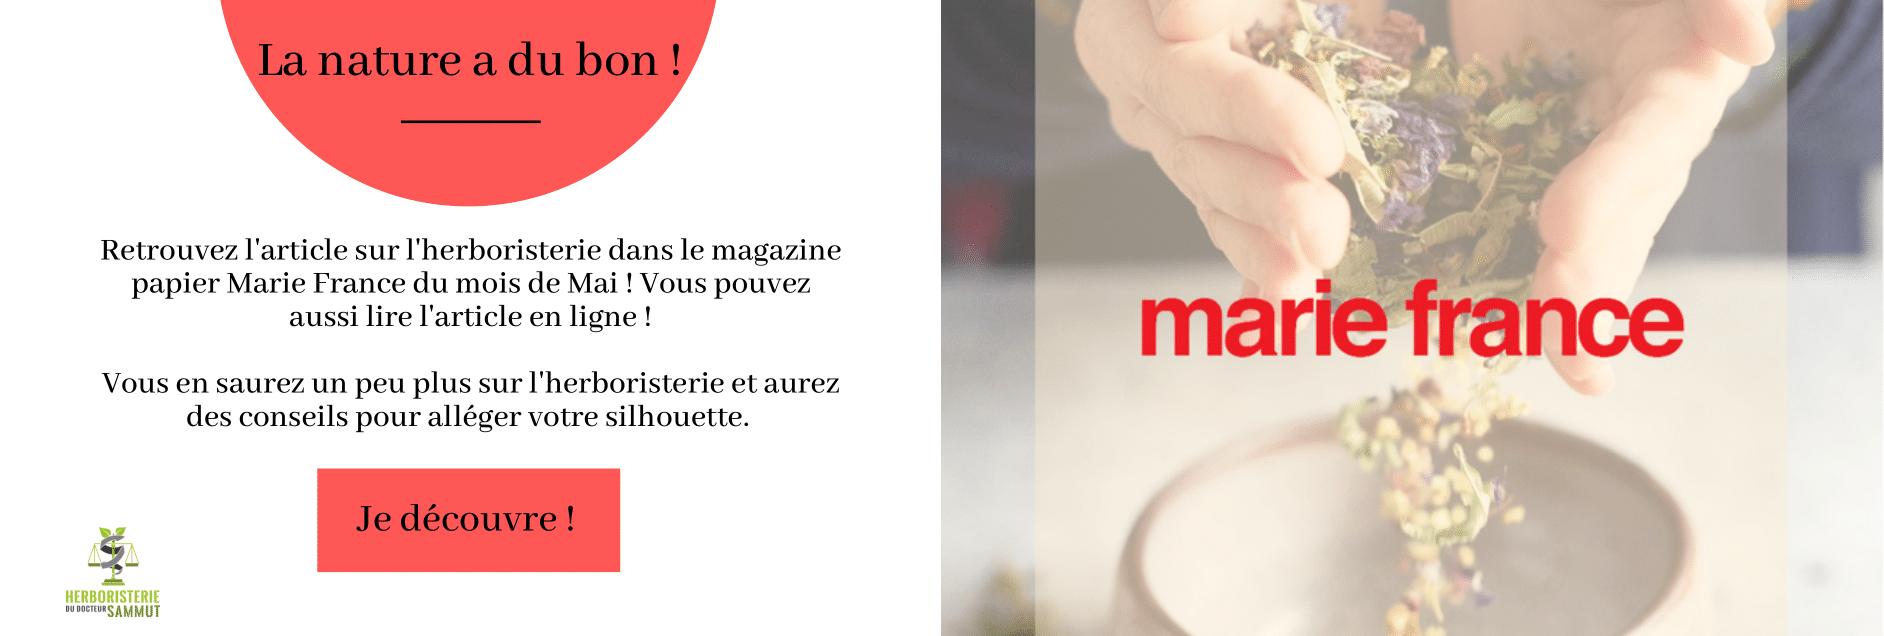 Parution presse Marie France Mai 2021